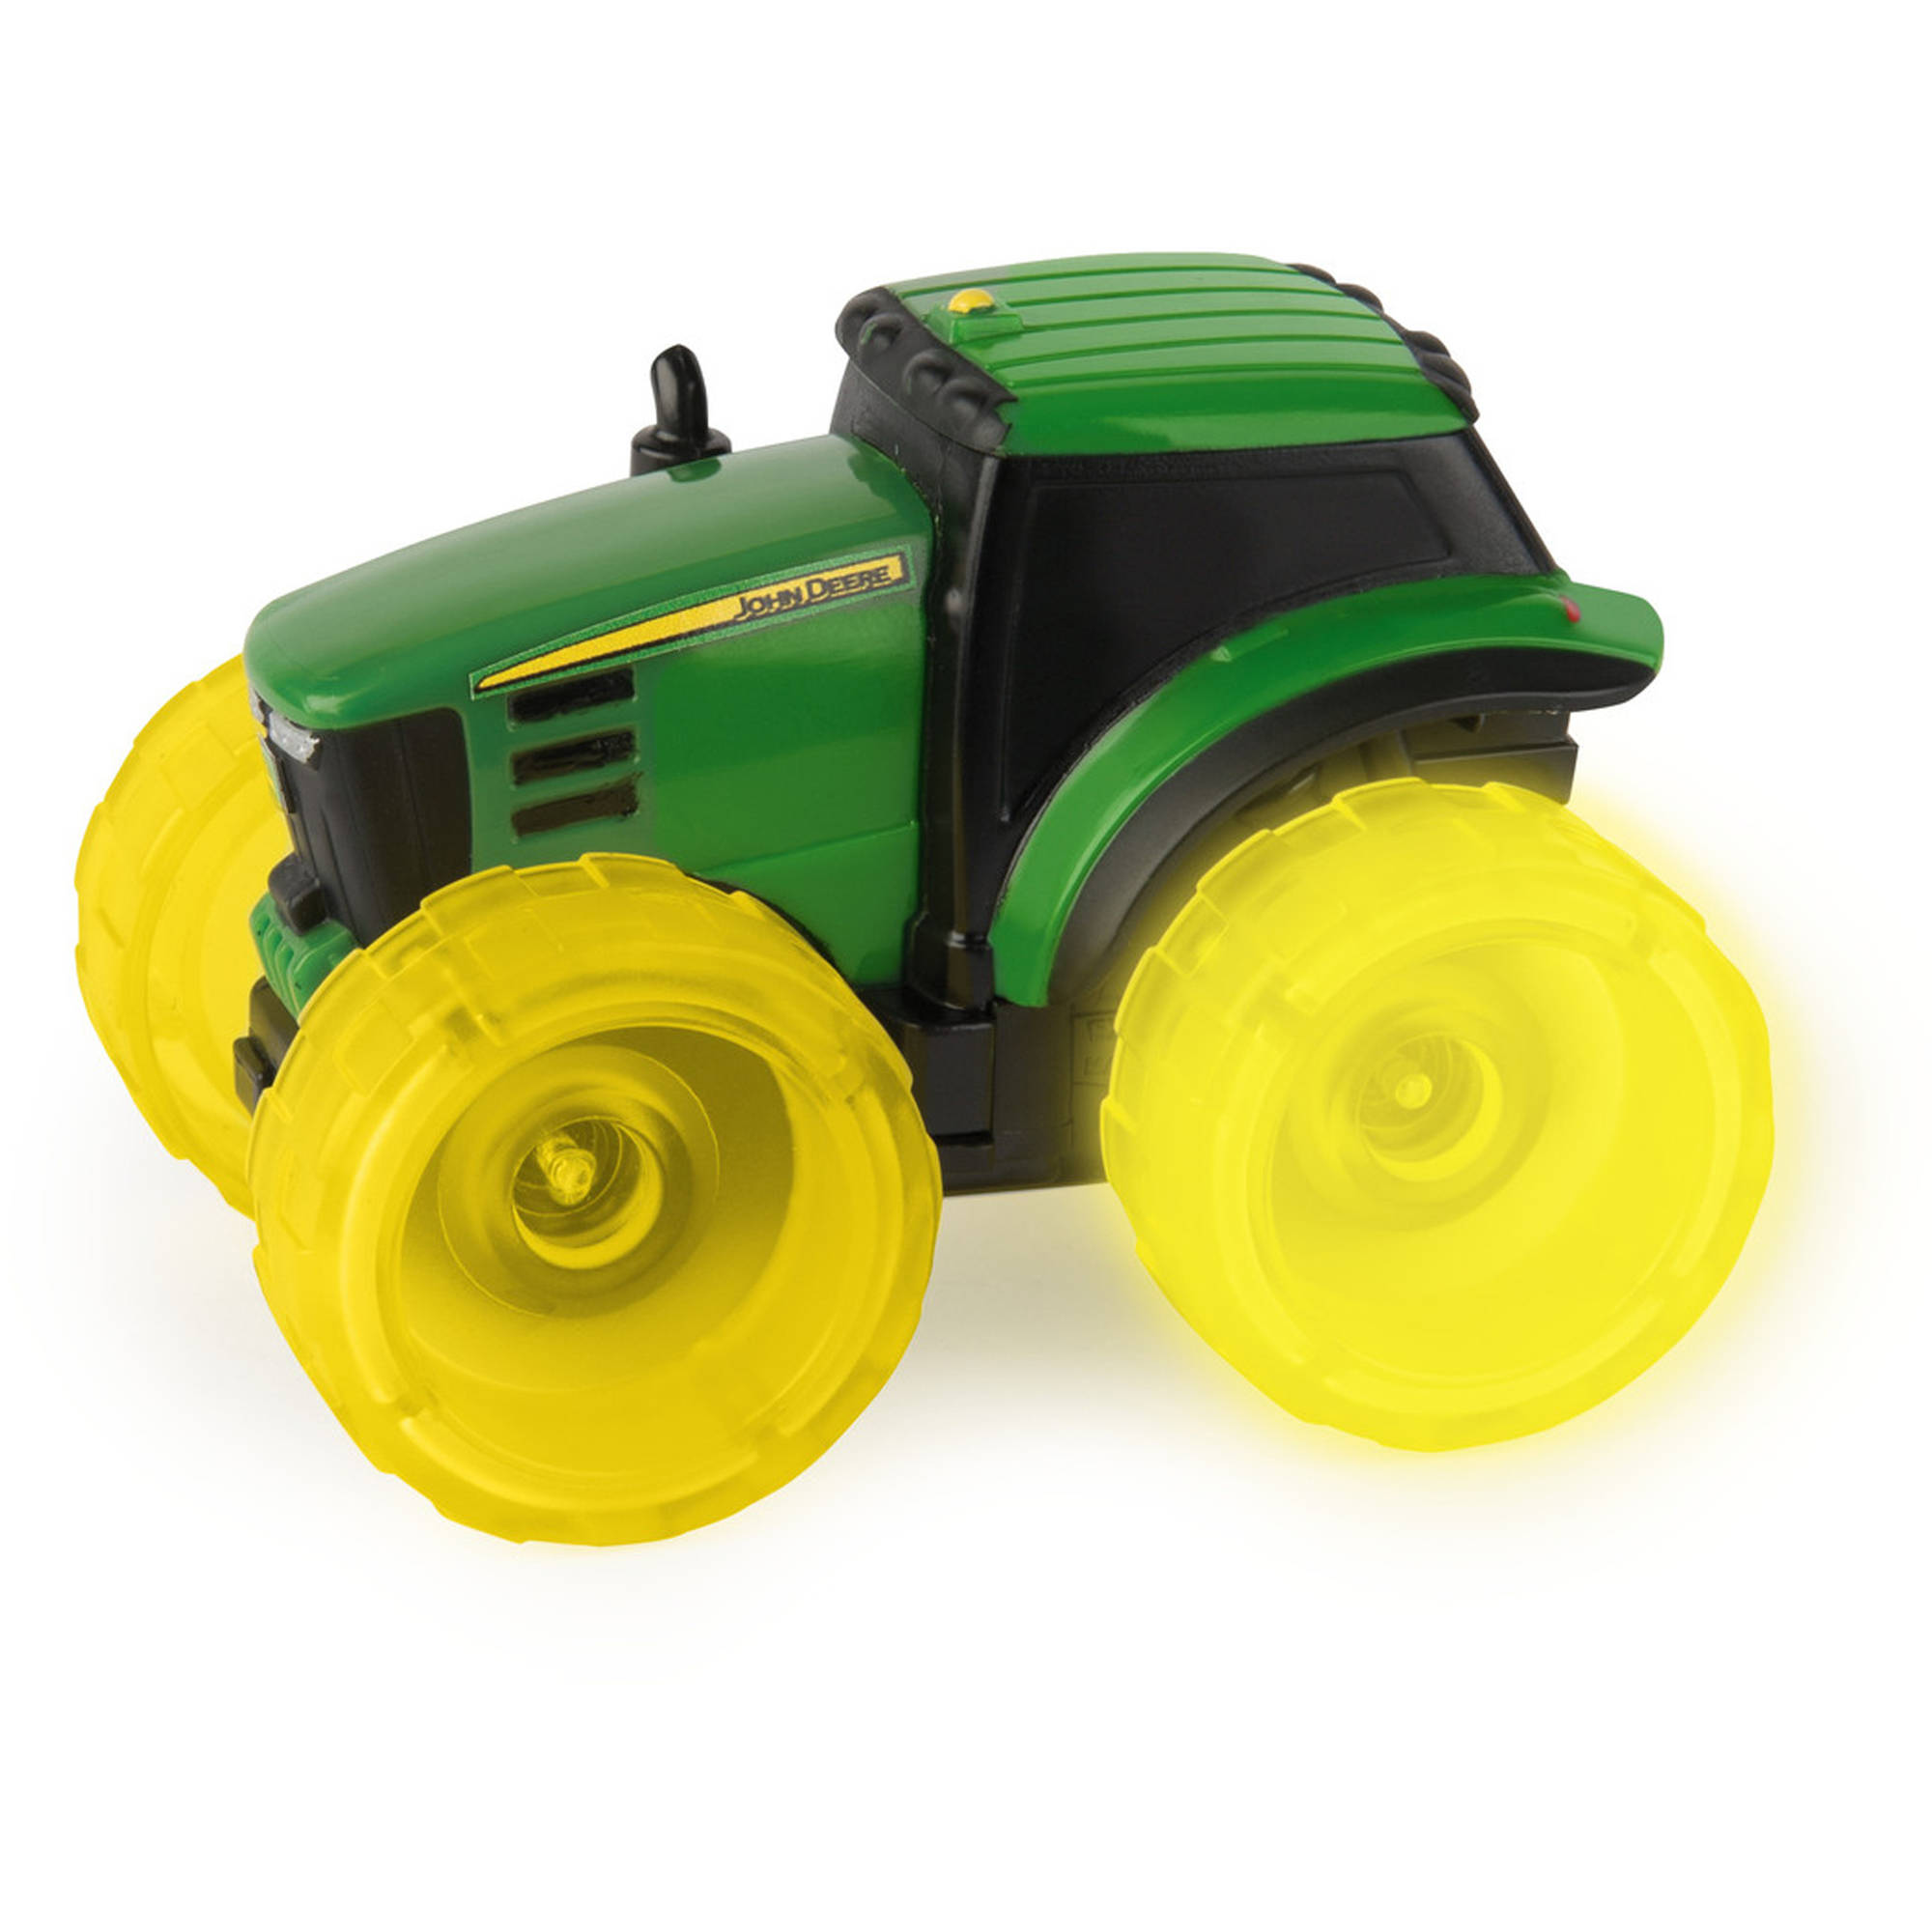 TOMY John Deere Monster Treads Lighting Wheels, Tractor